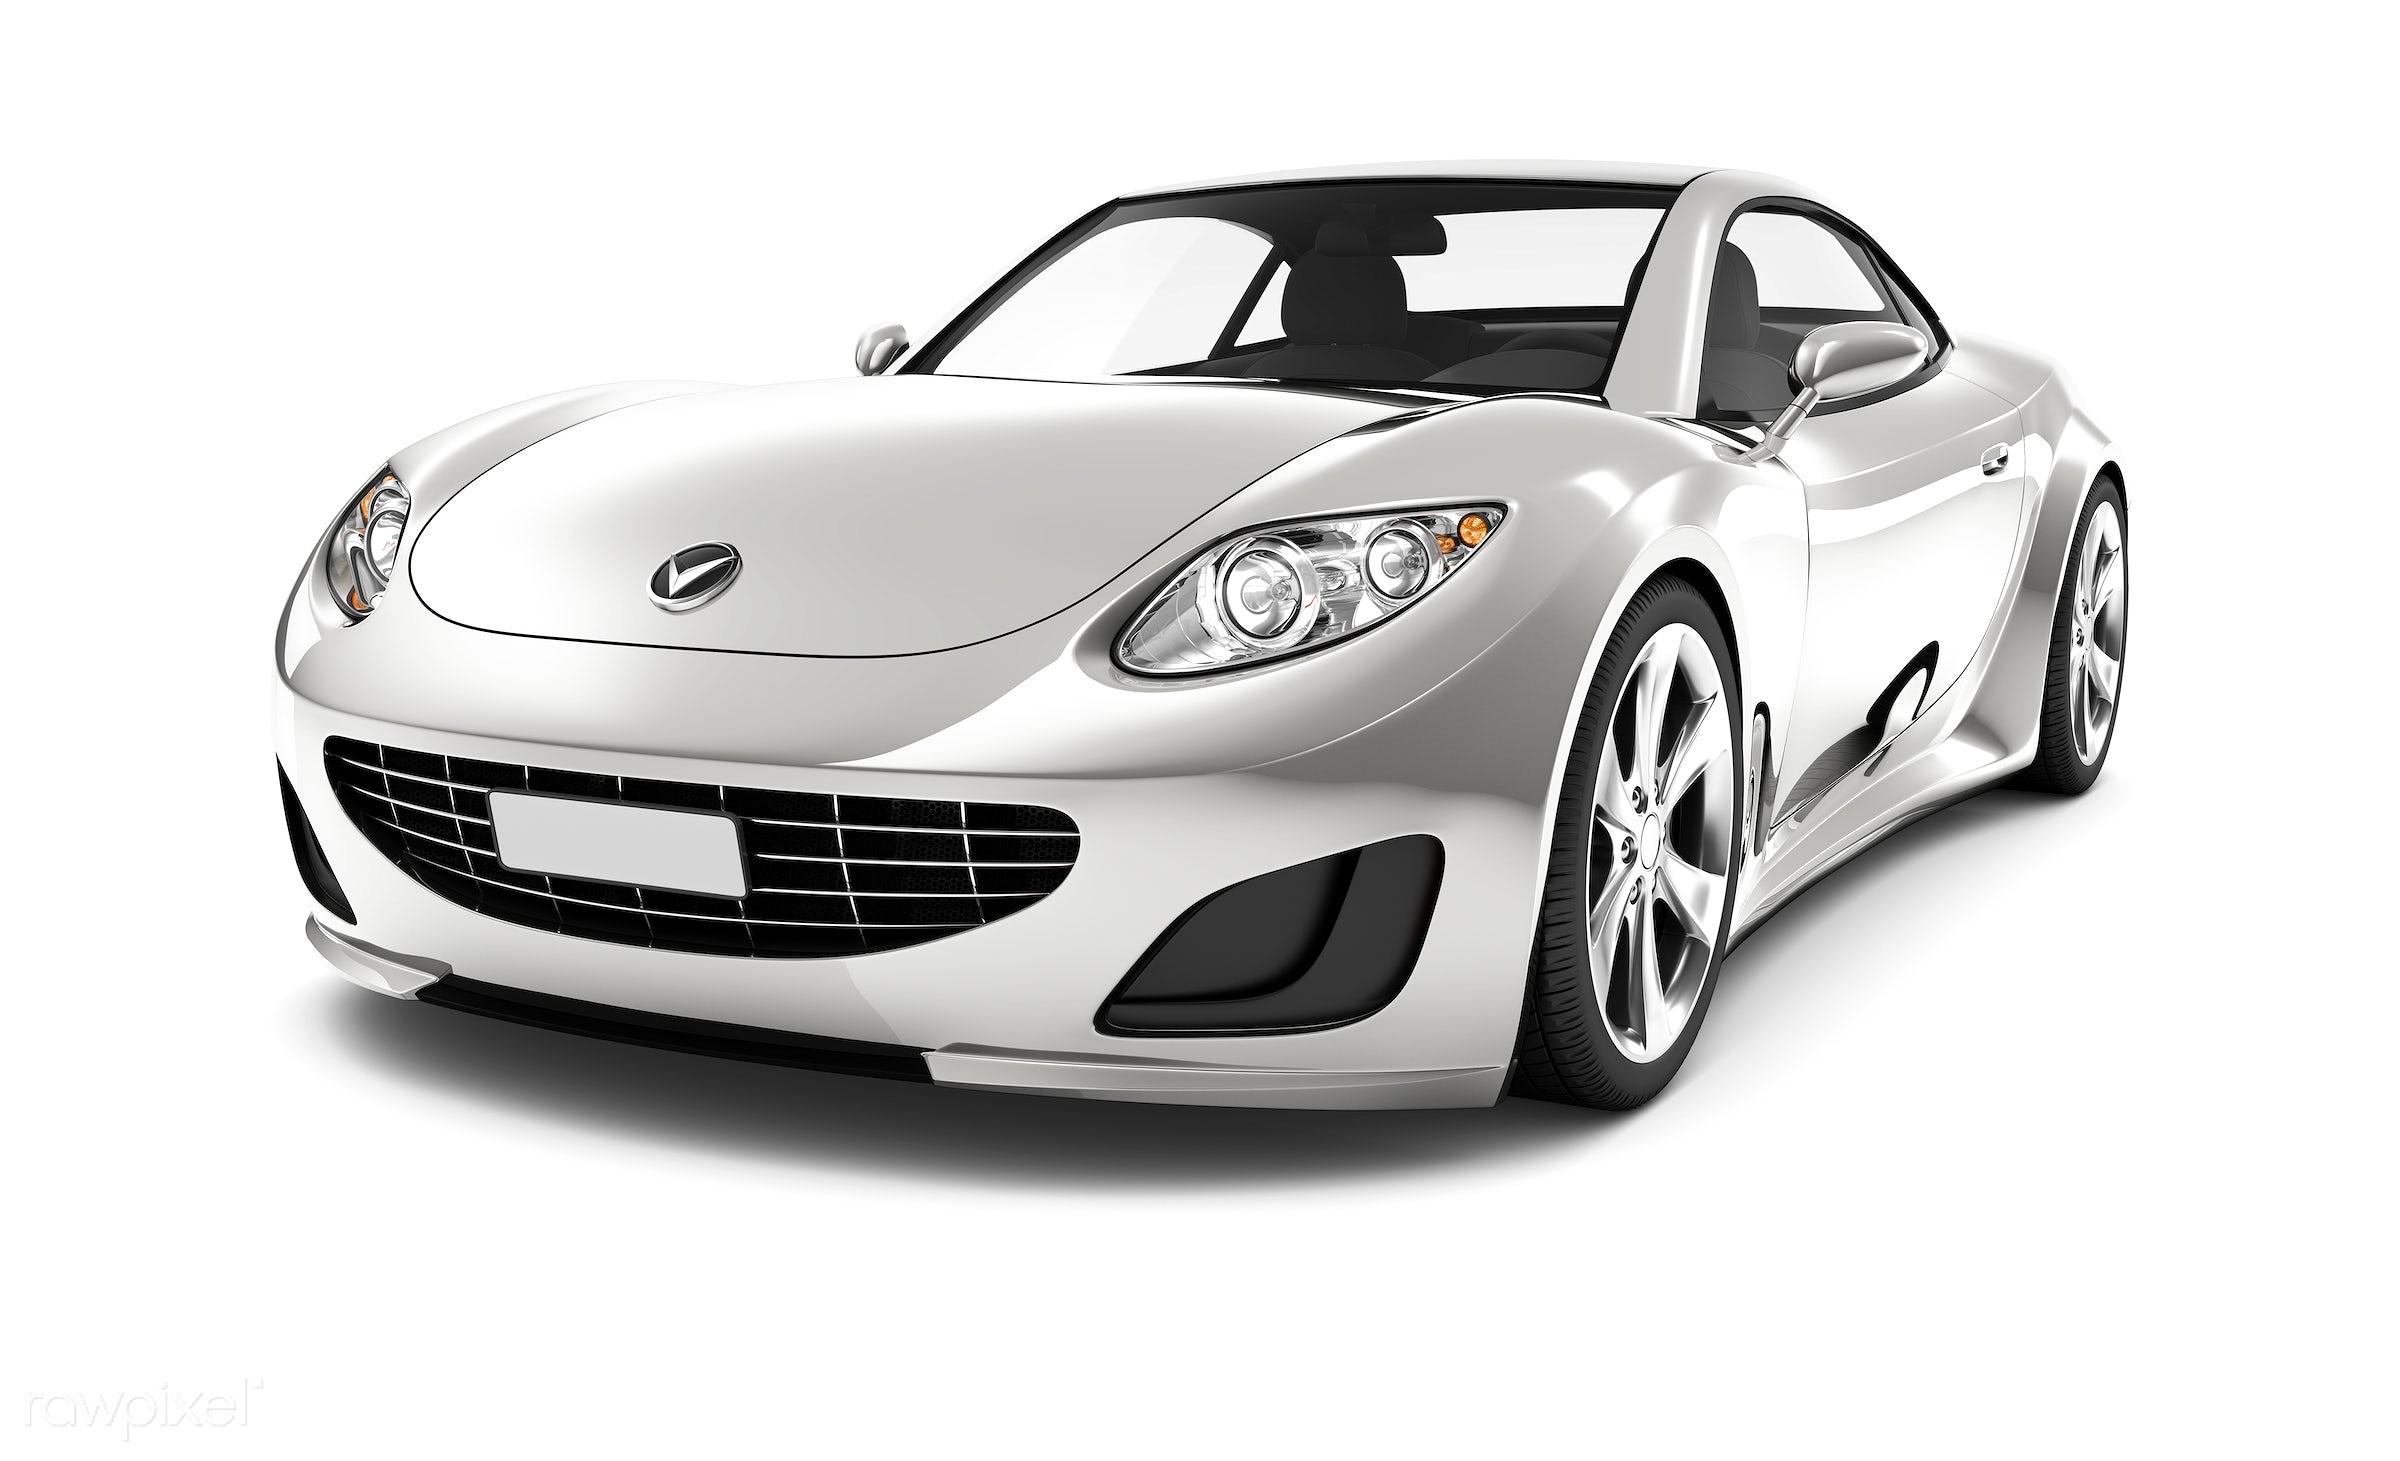 Three dimensional image of car - 3d, automobile, automotive, brandless, bronze, car, concept car, elegant, graphic, grey,...